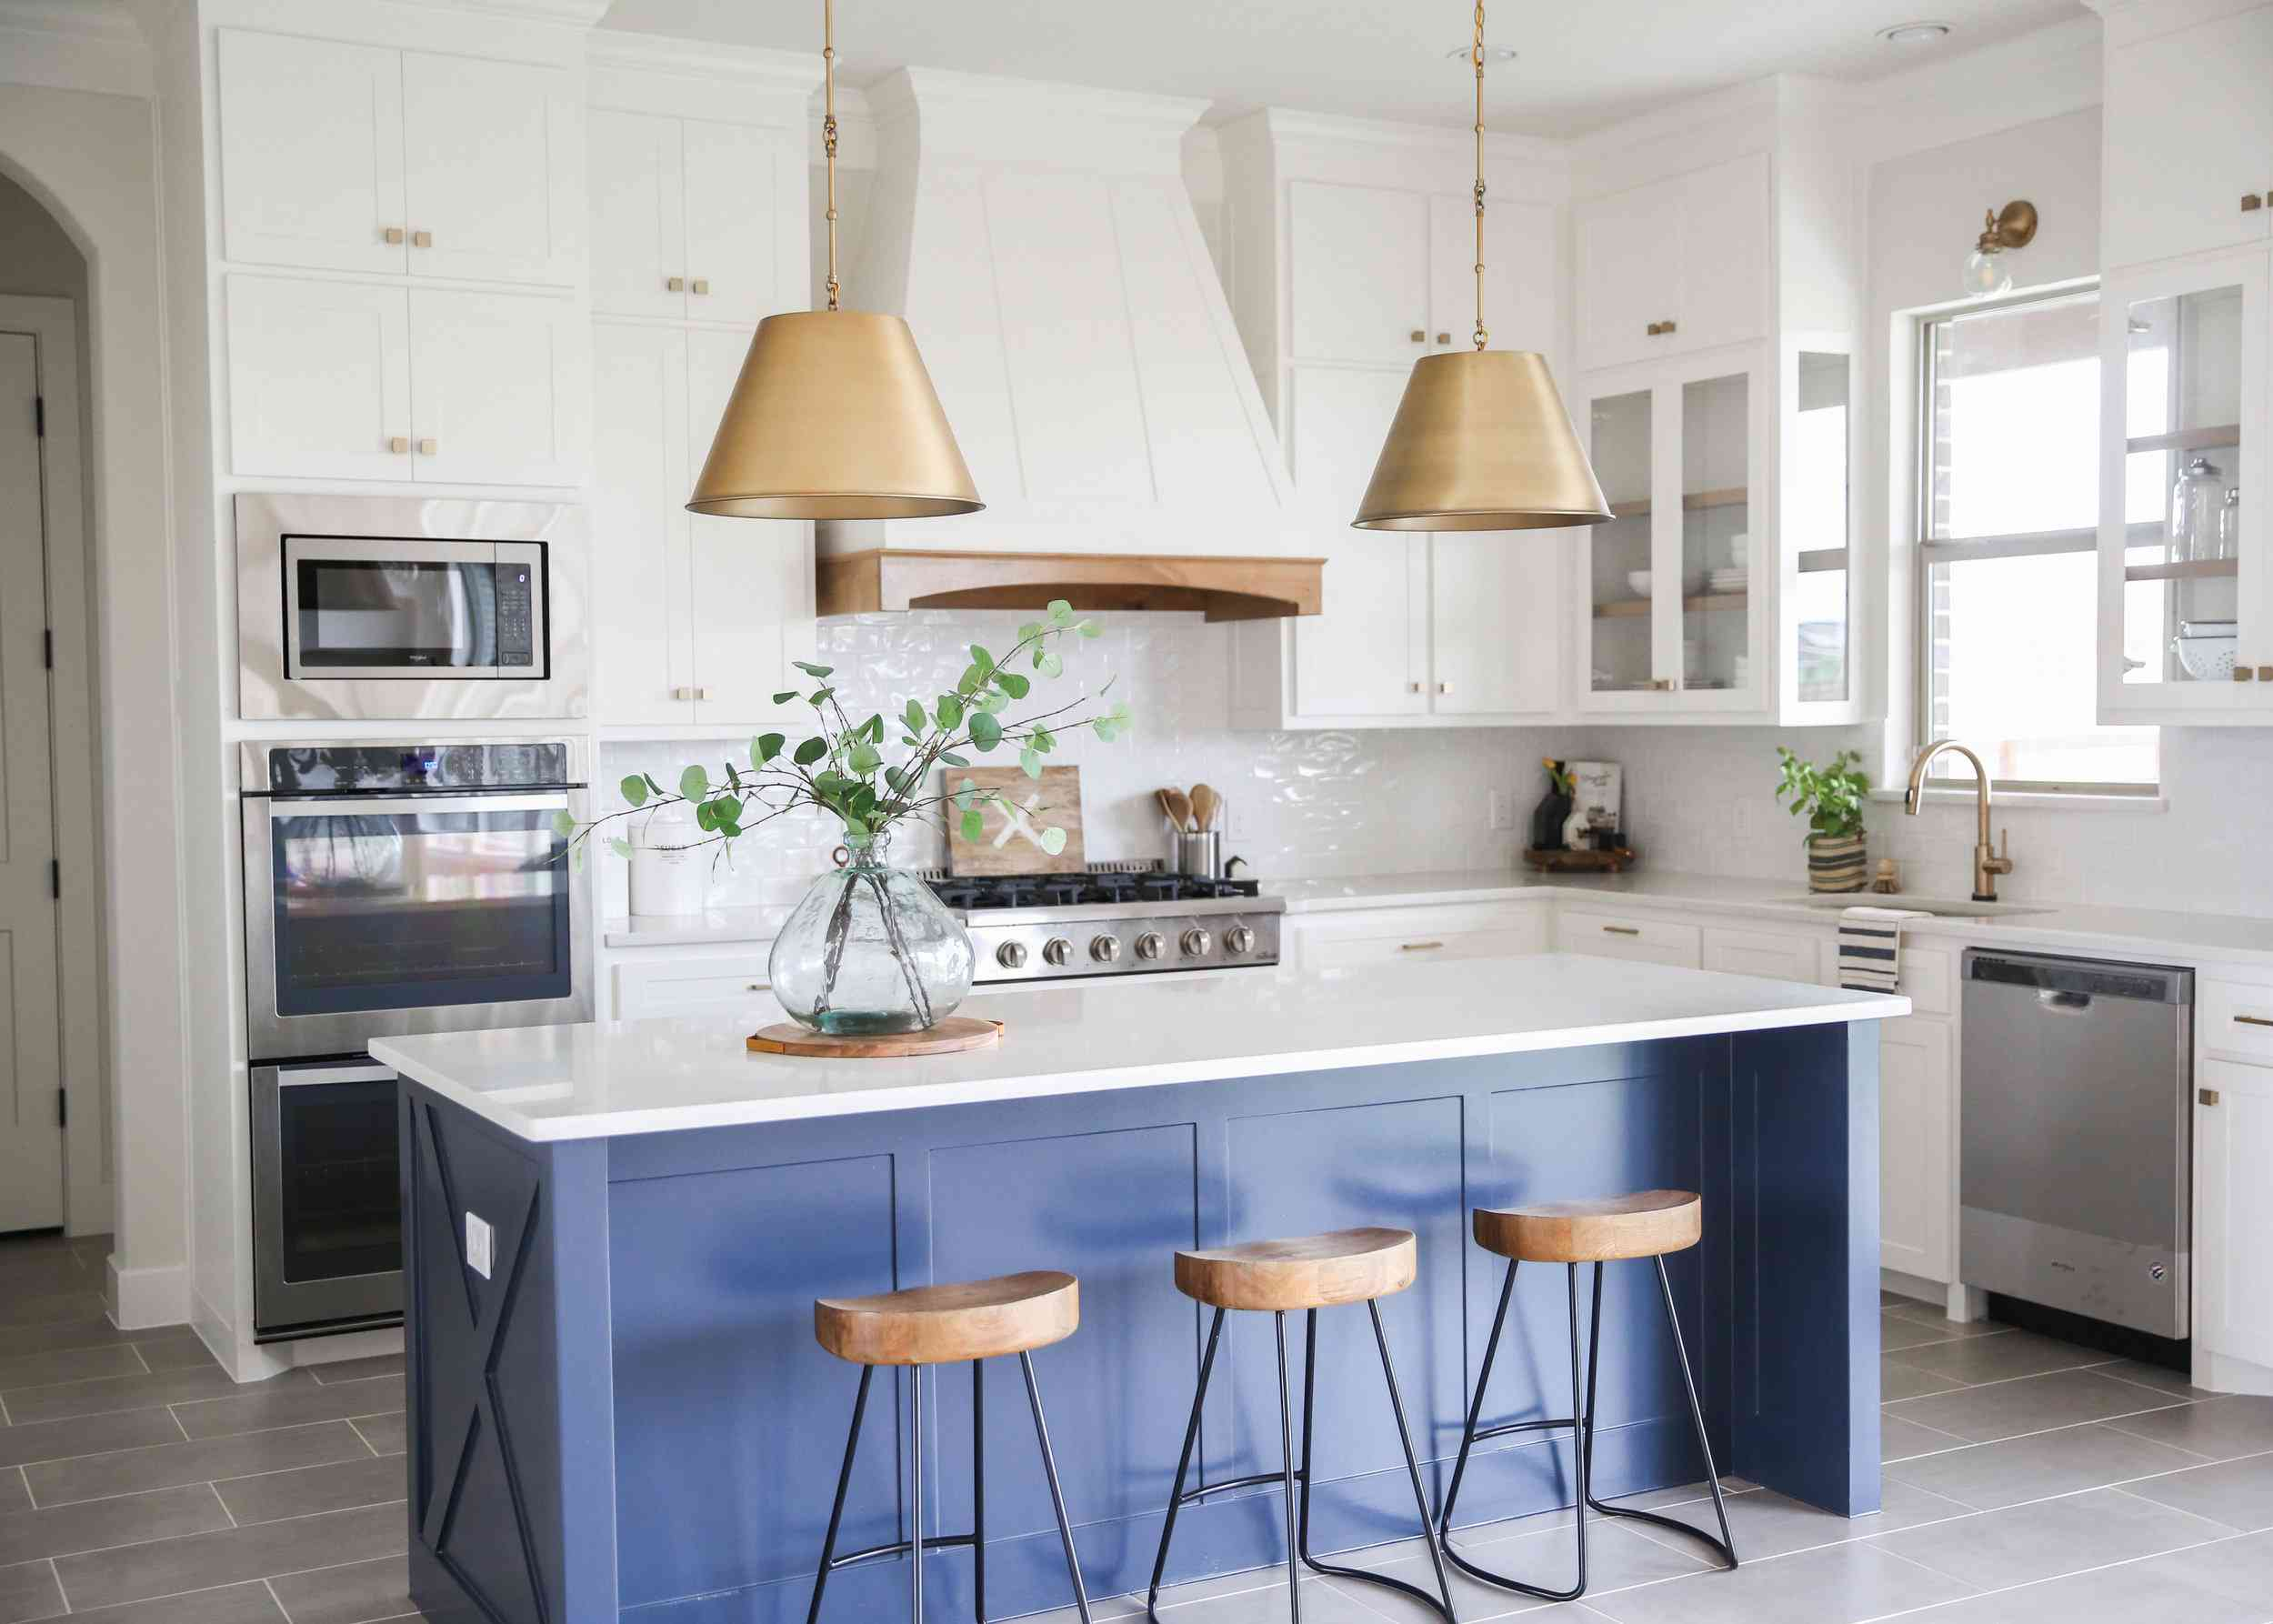 21 Beautiful Blue And White Kitchen Design Ideas